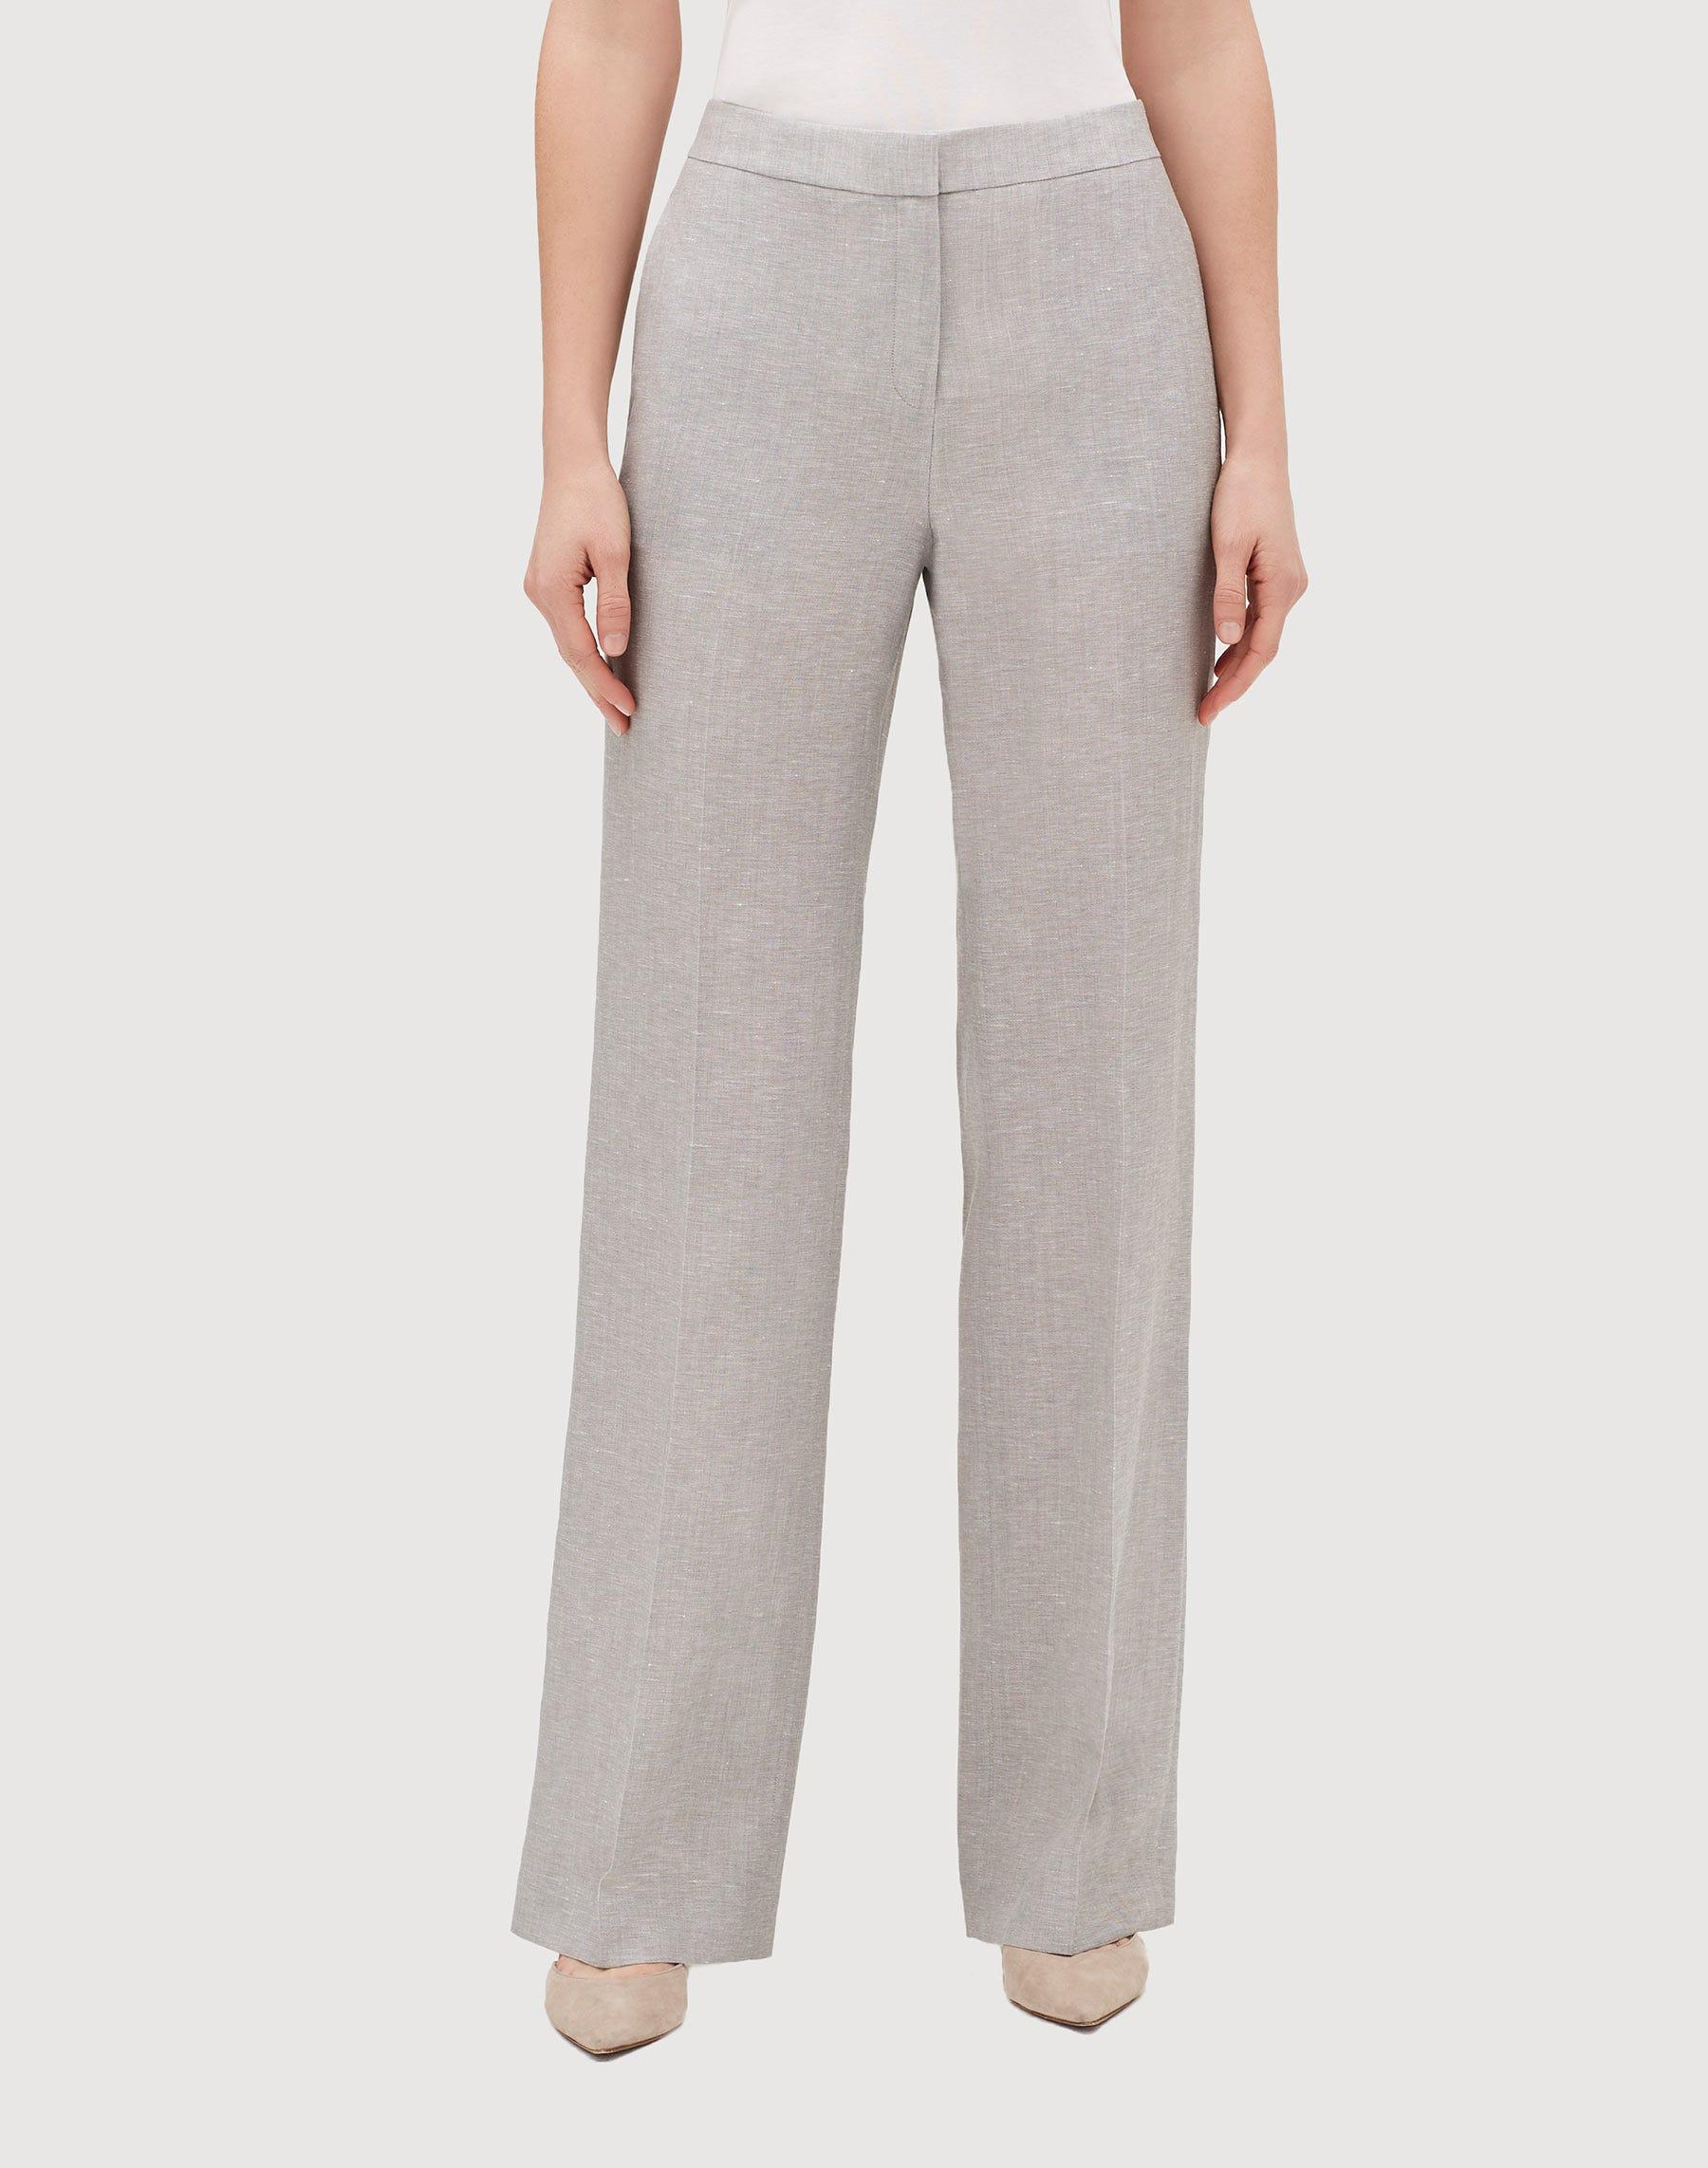 a775fa30f Women's Petite Pants | Lafayette 148 New York | Lafayette 148 New York